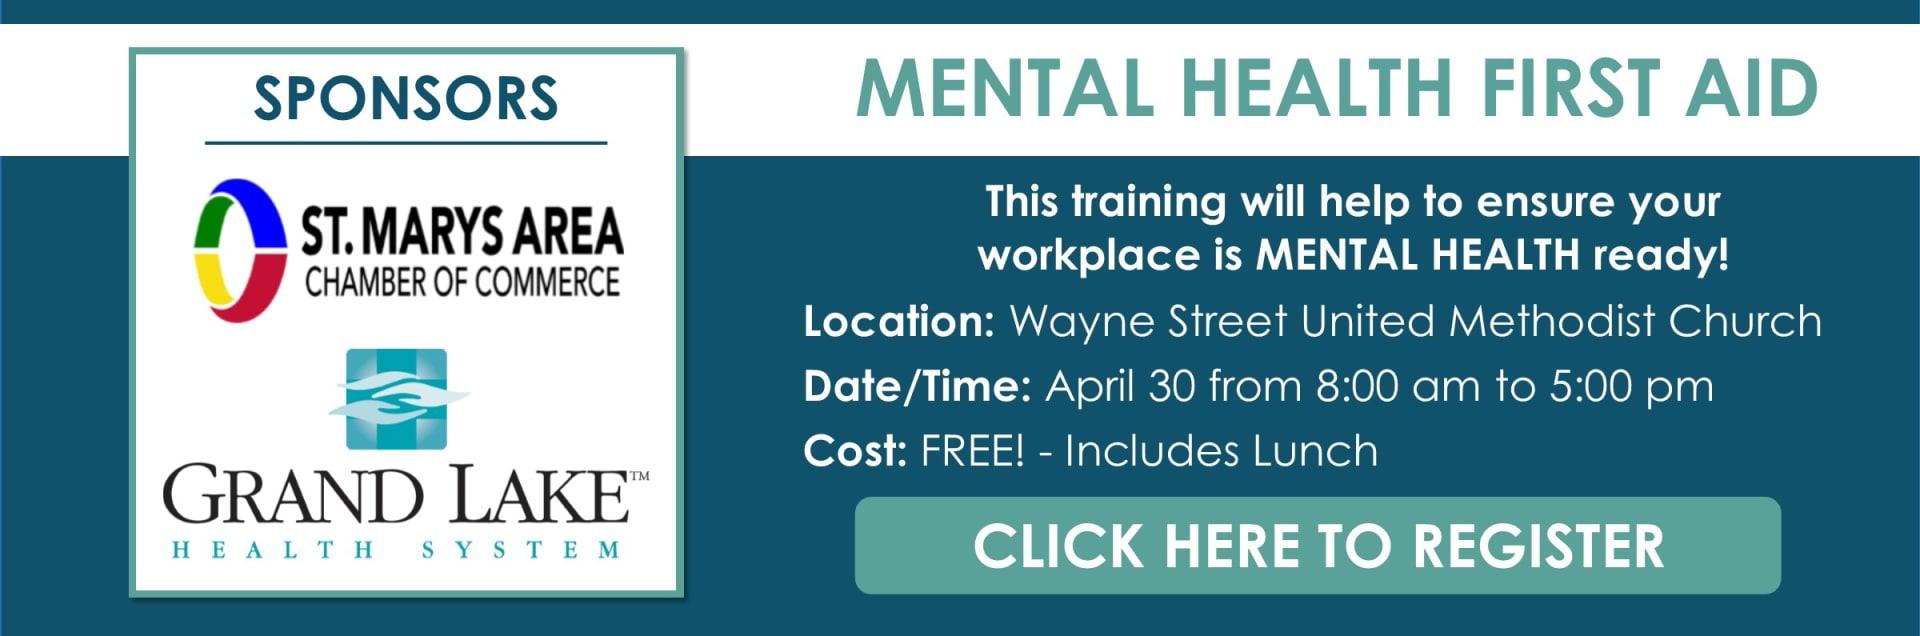 Mental-Health-w1920.jpg